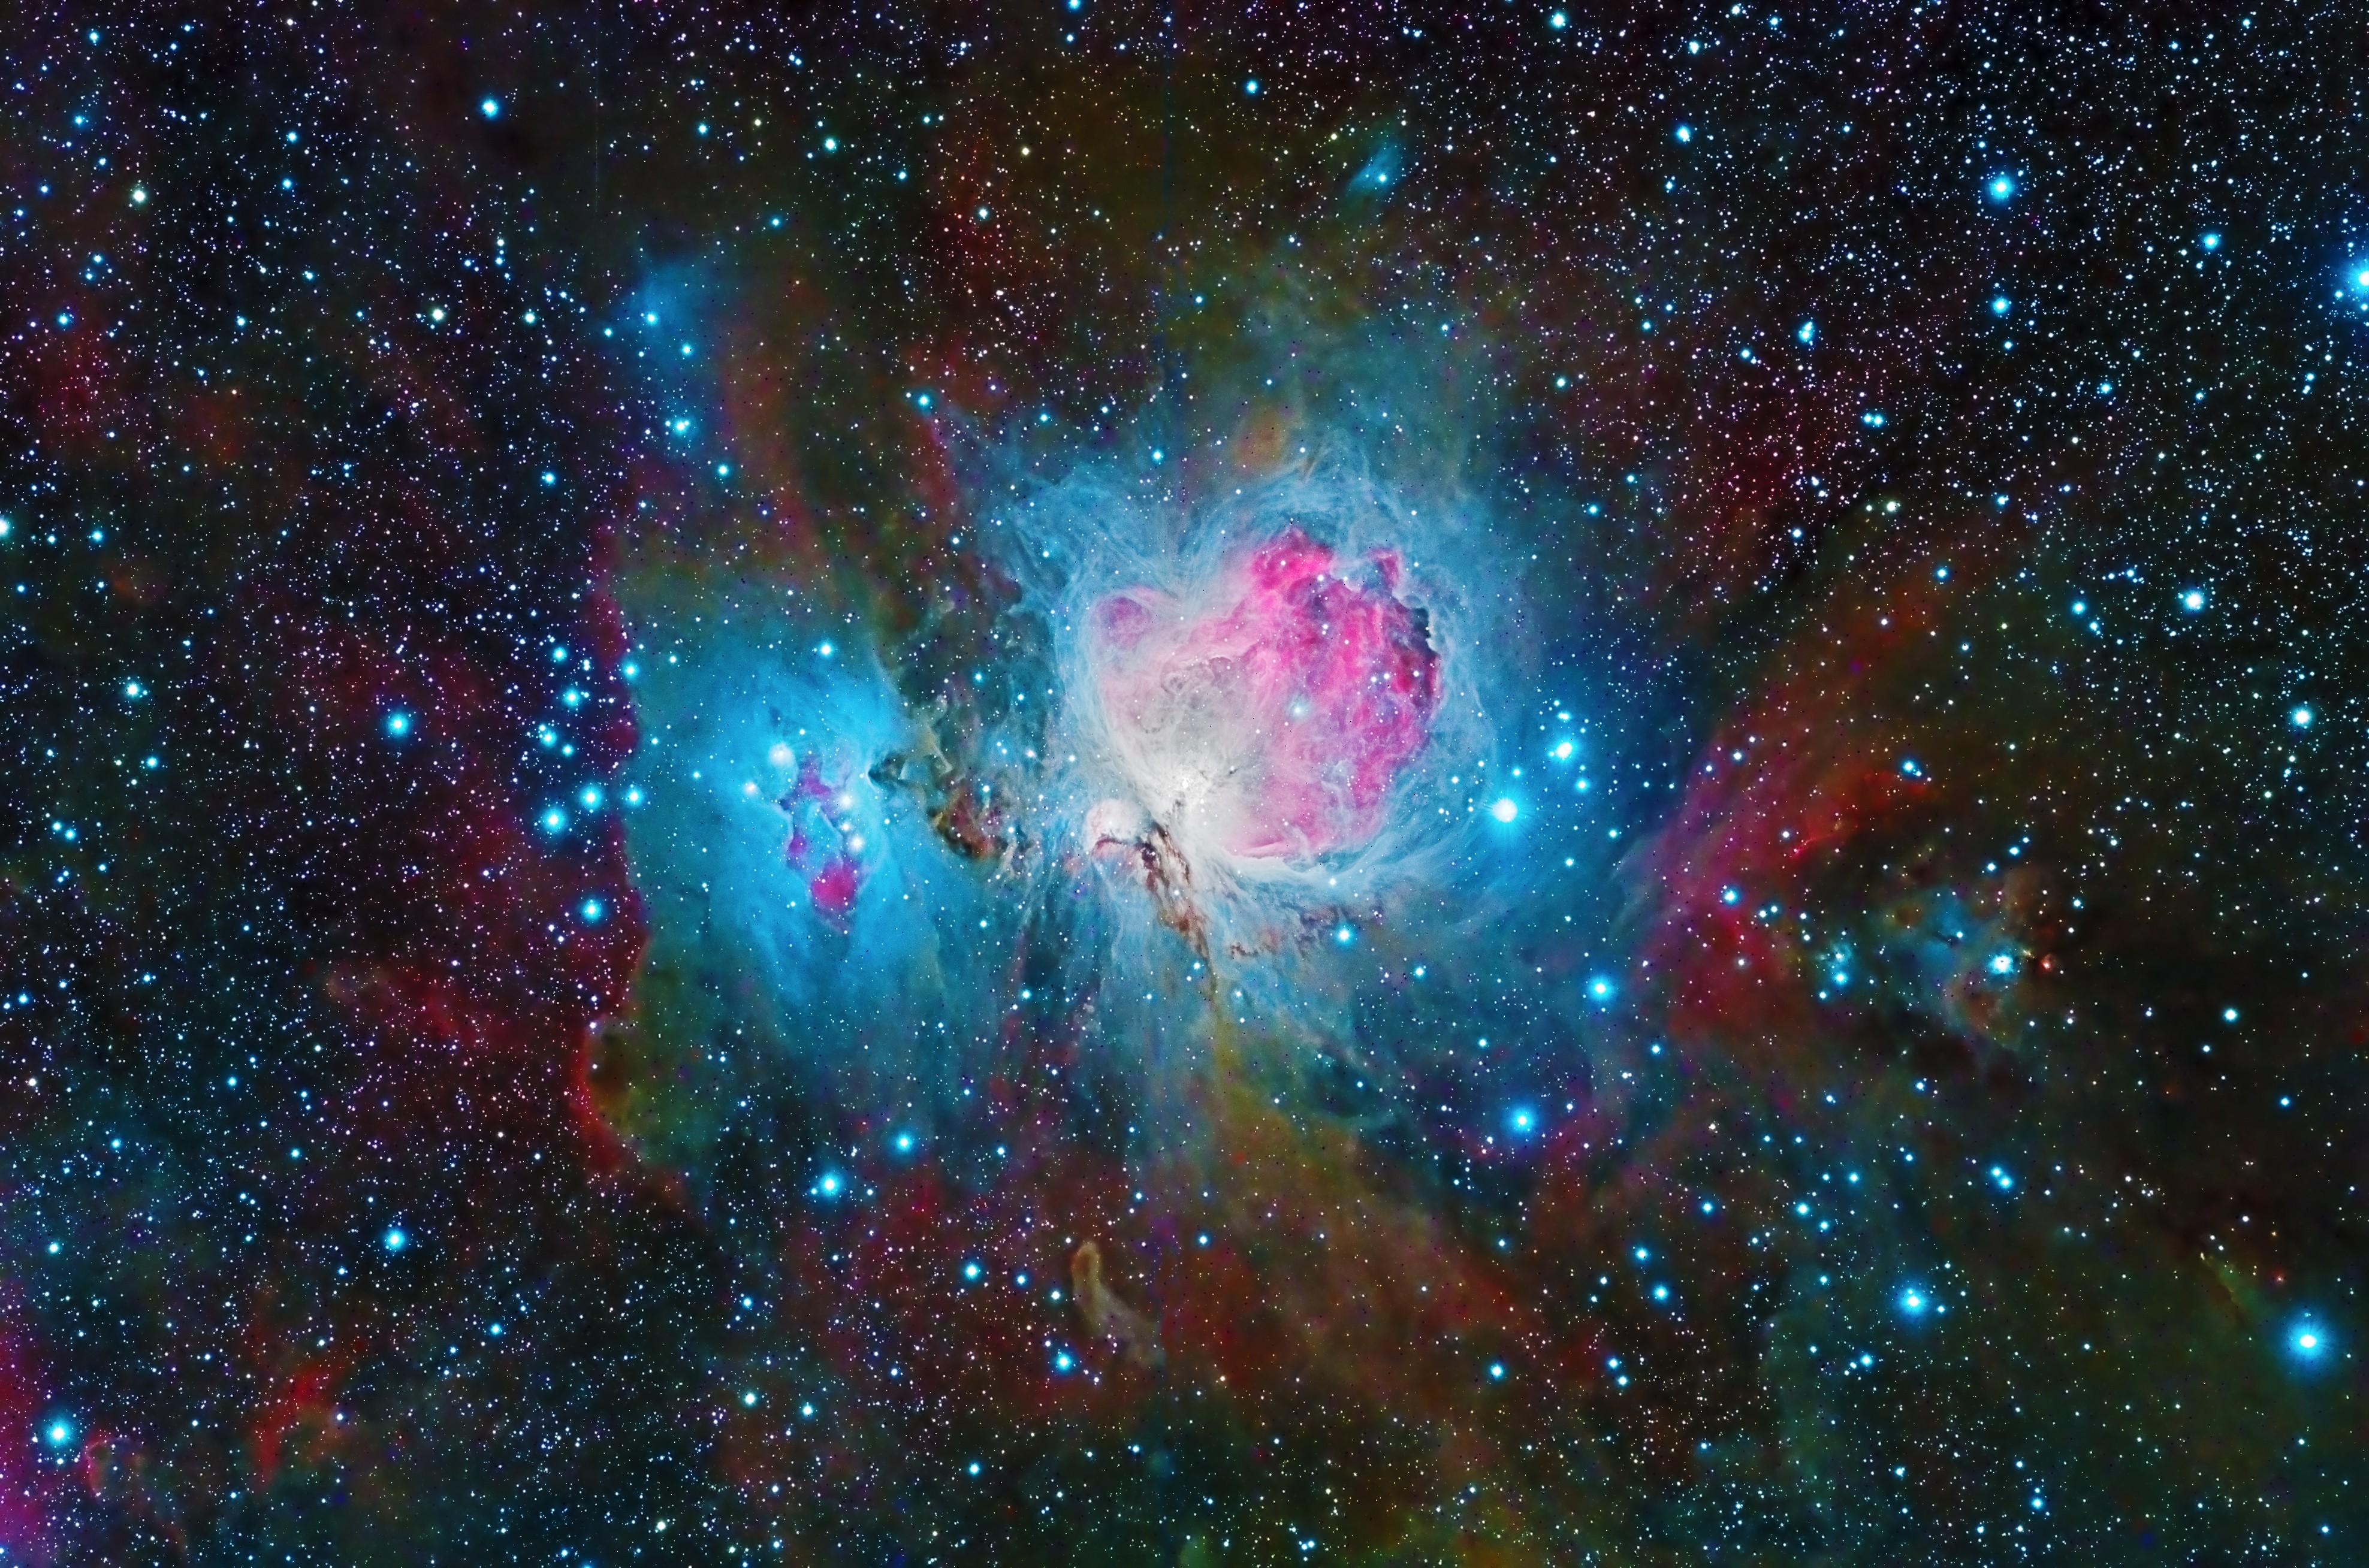 3840x2160 nebula space galaxy colorful 4k 4k hd 4k